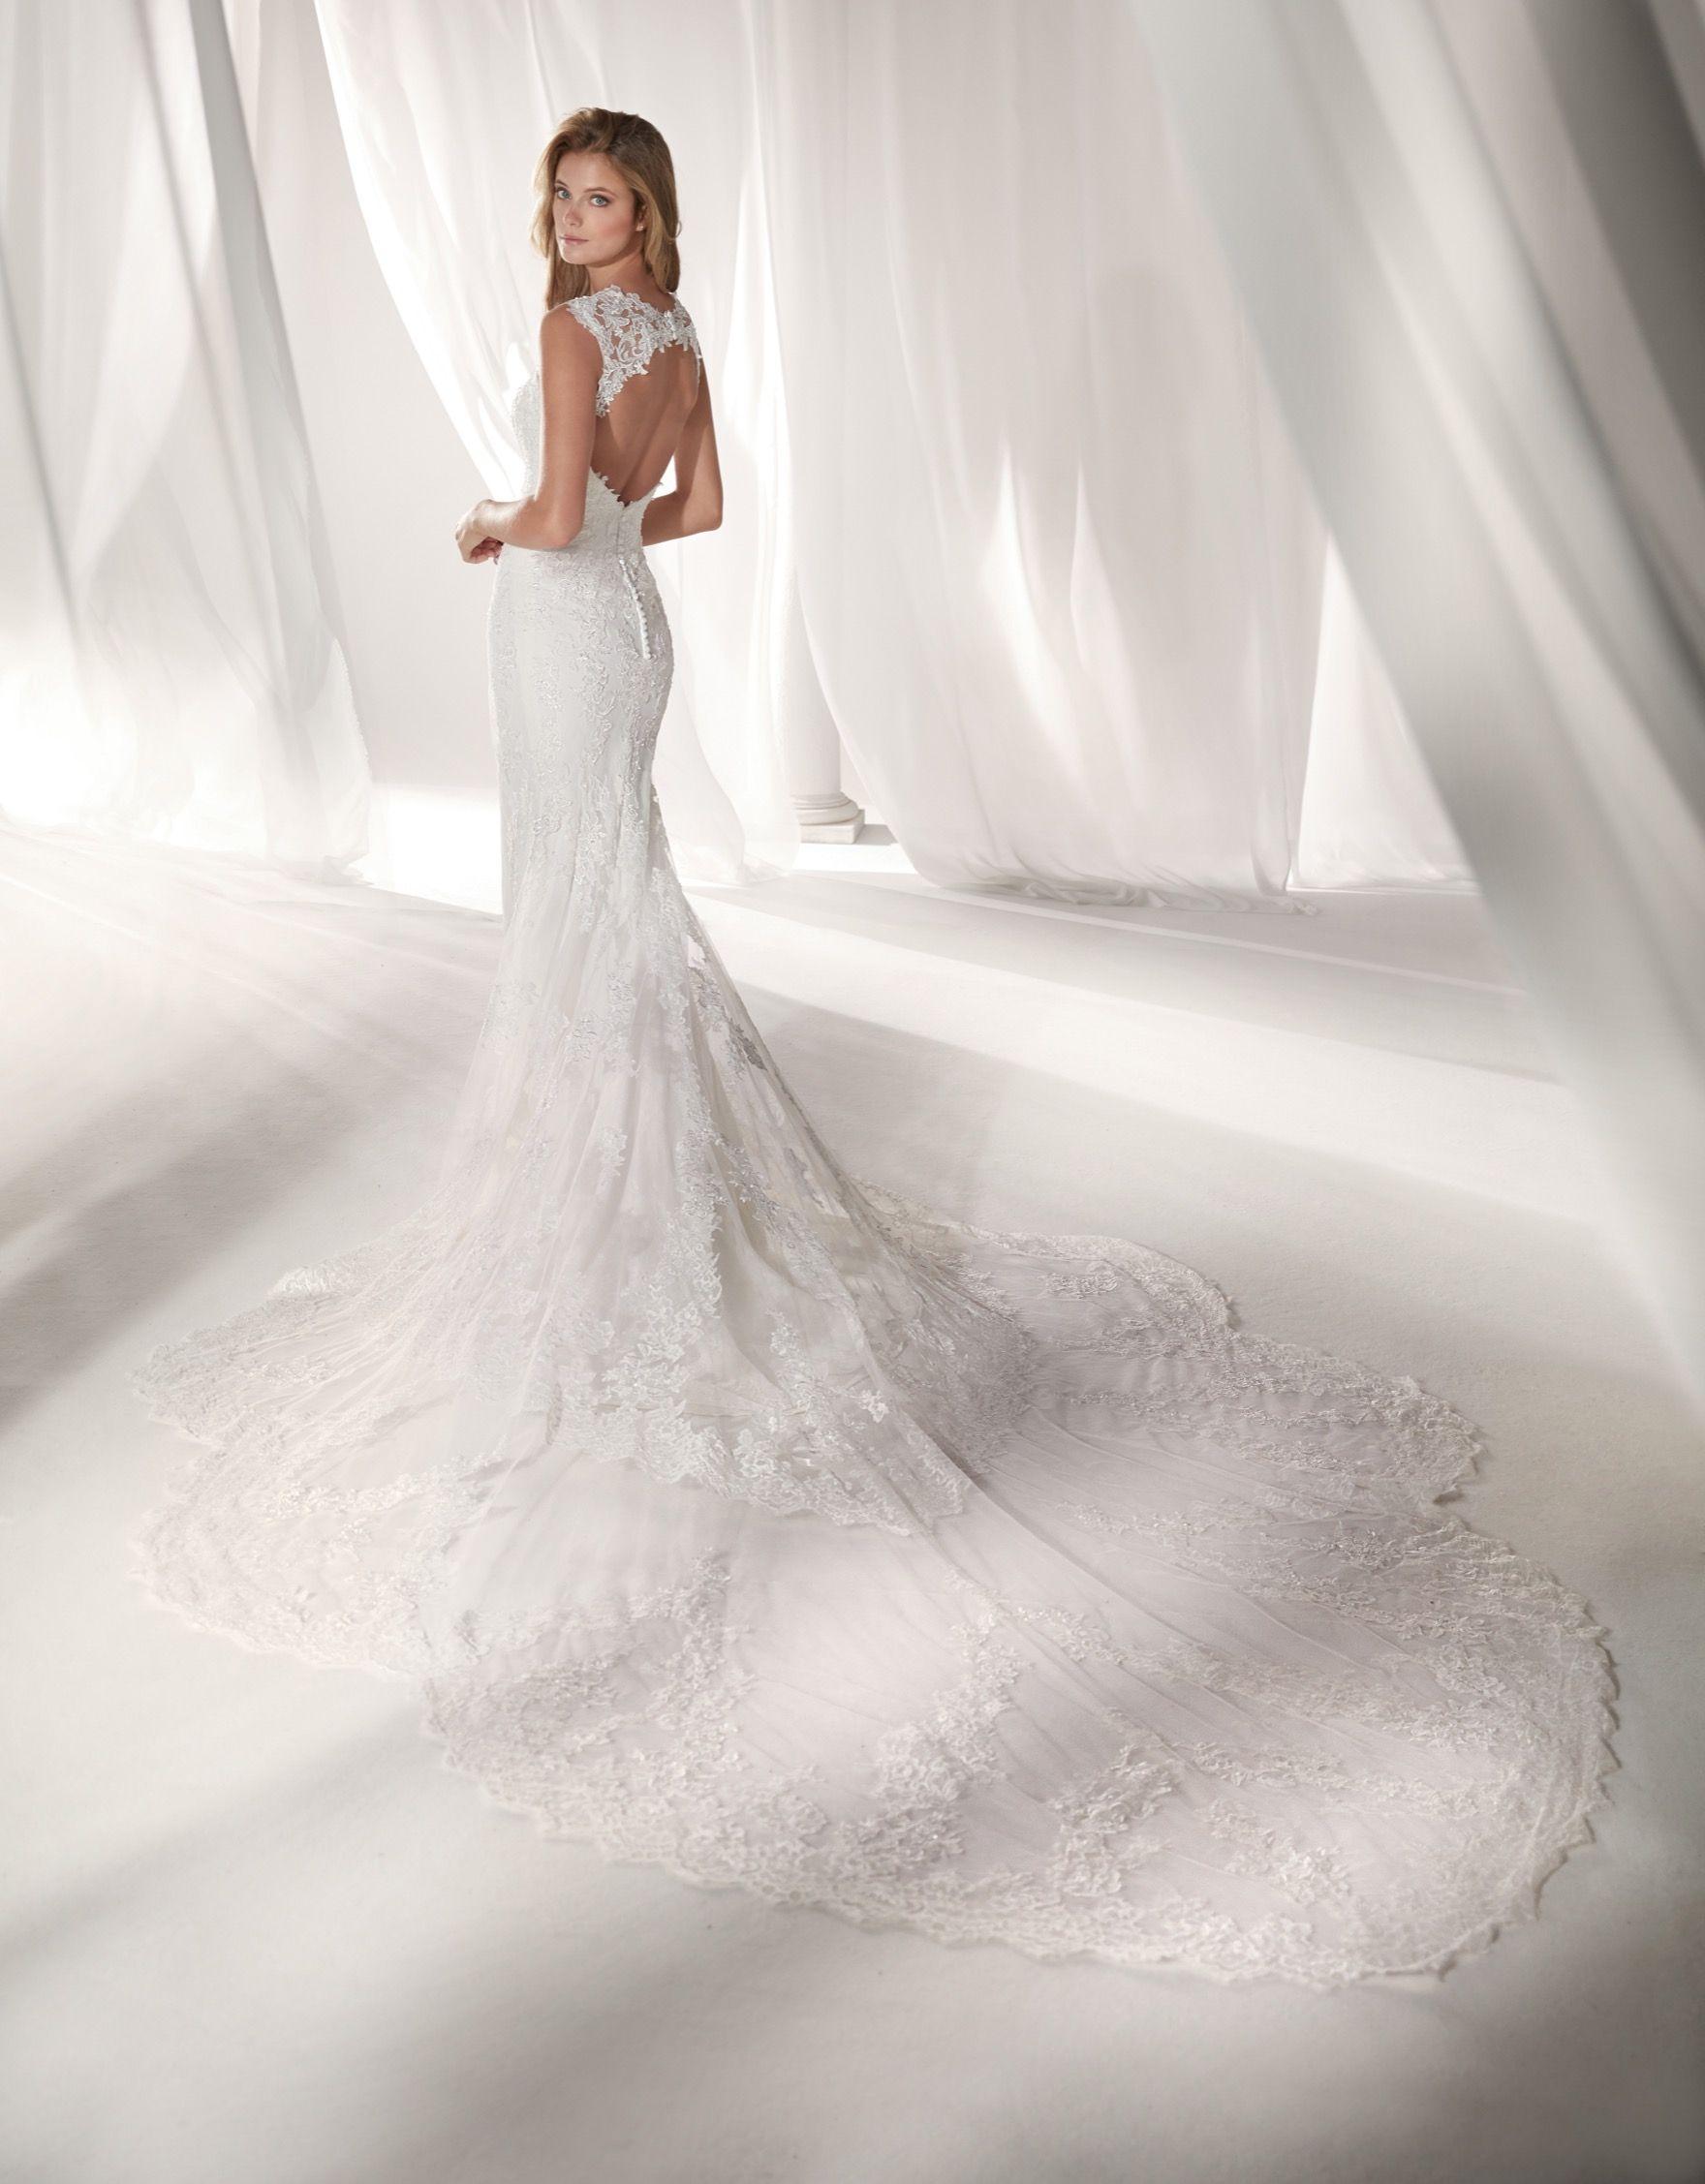 Niab19114 Nicole 2019 Collection Wonderful Ivory Mermaid Dress In Tulle Chantilly Lace And Beaded Rebrode Lac Bellissimi Abiti Da Sposa Abiti Da Sposa Sposa